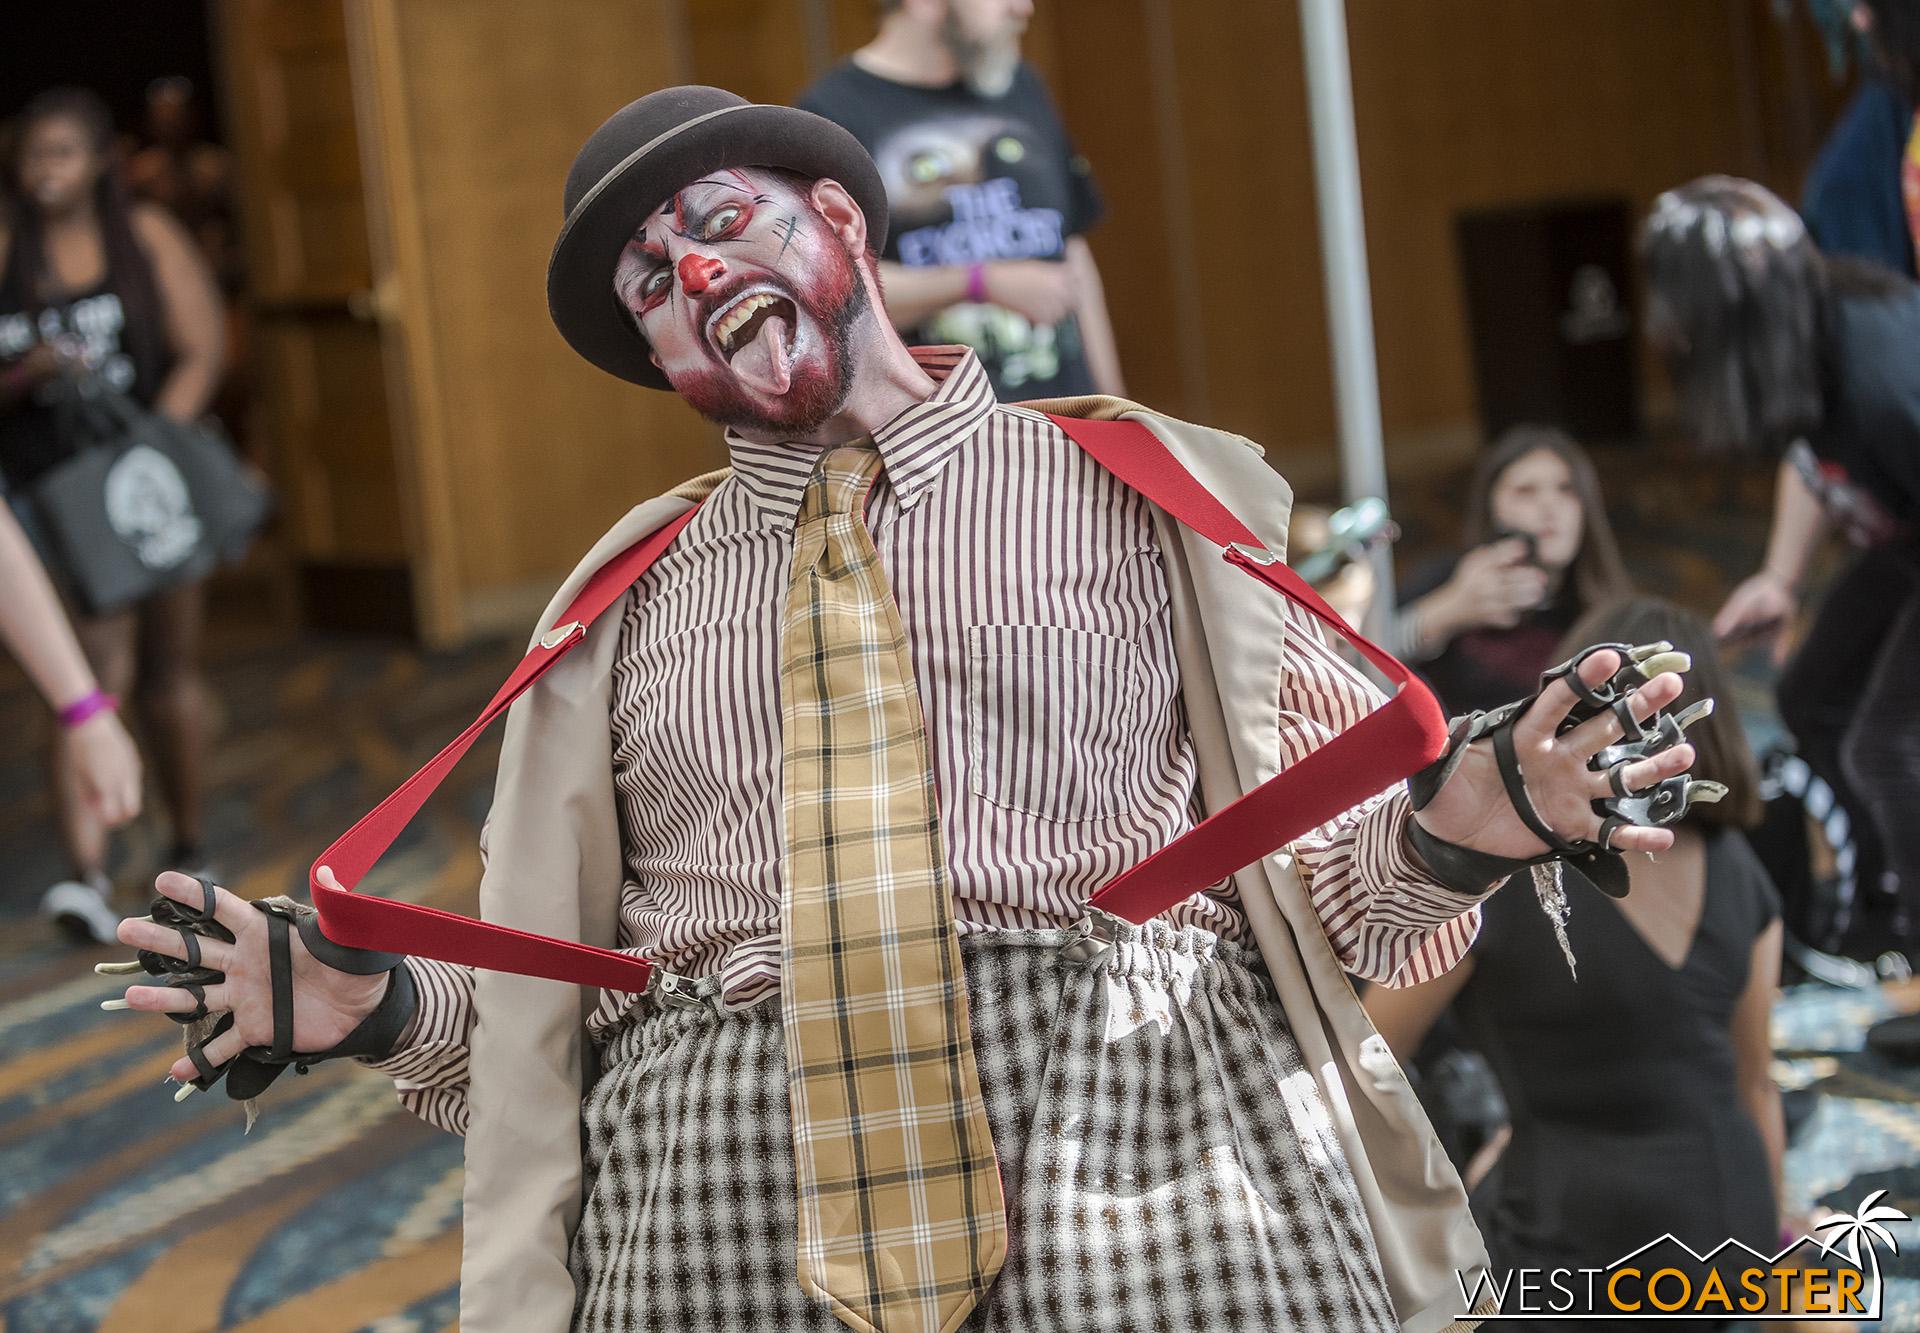 Great pose, clown!